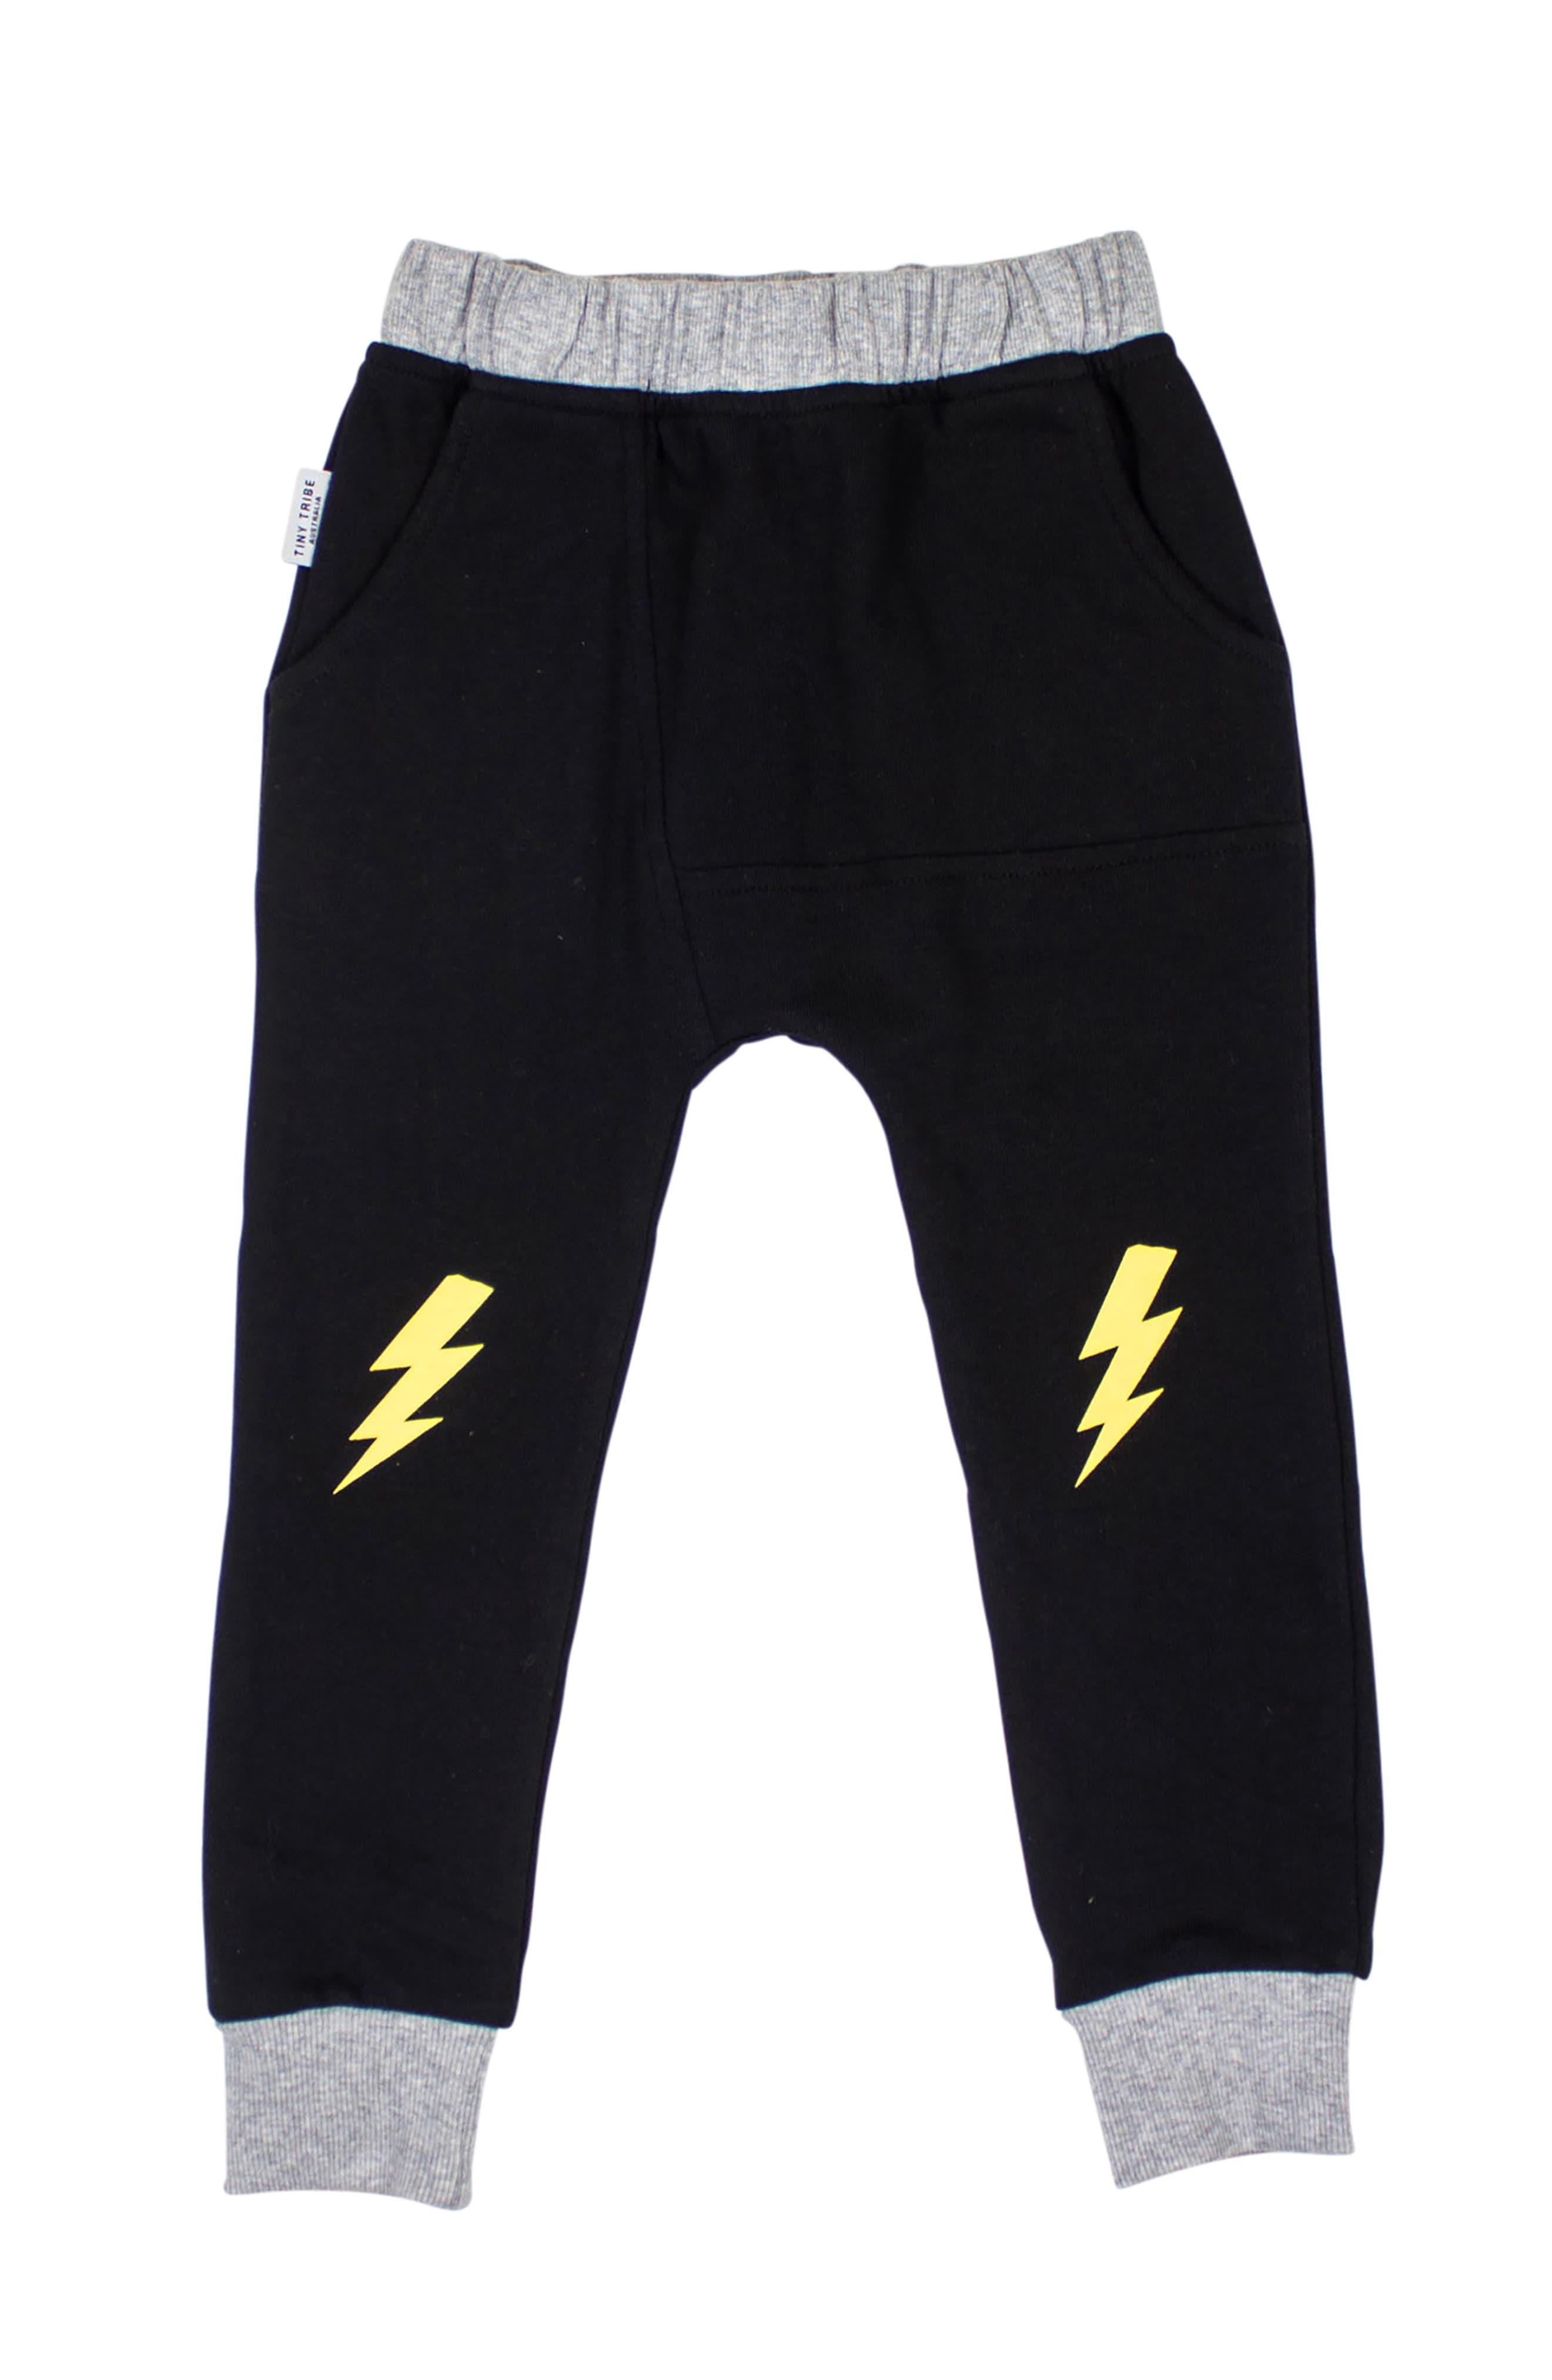 Lightning Sweatpants,                             Main thumbnail 1, color,                             BLACK/ YELLOW